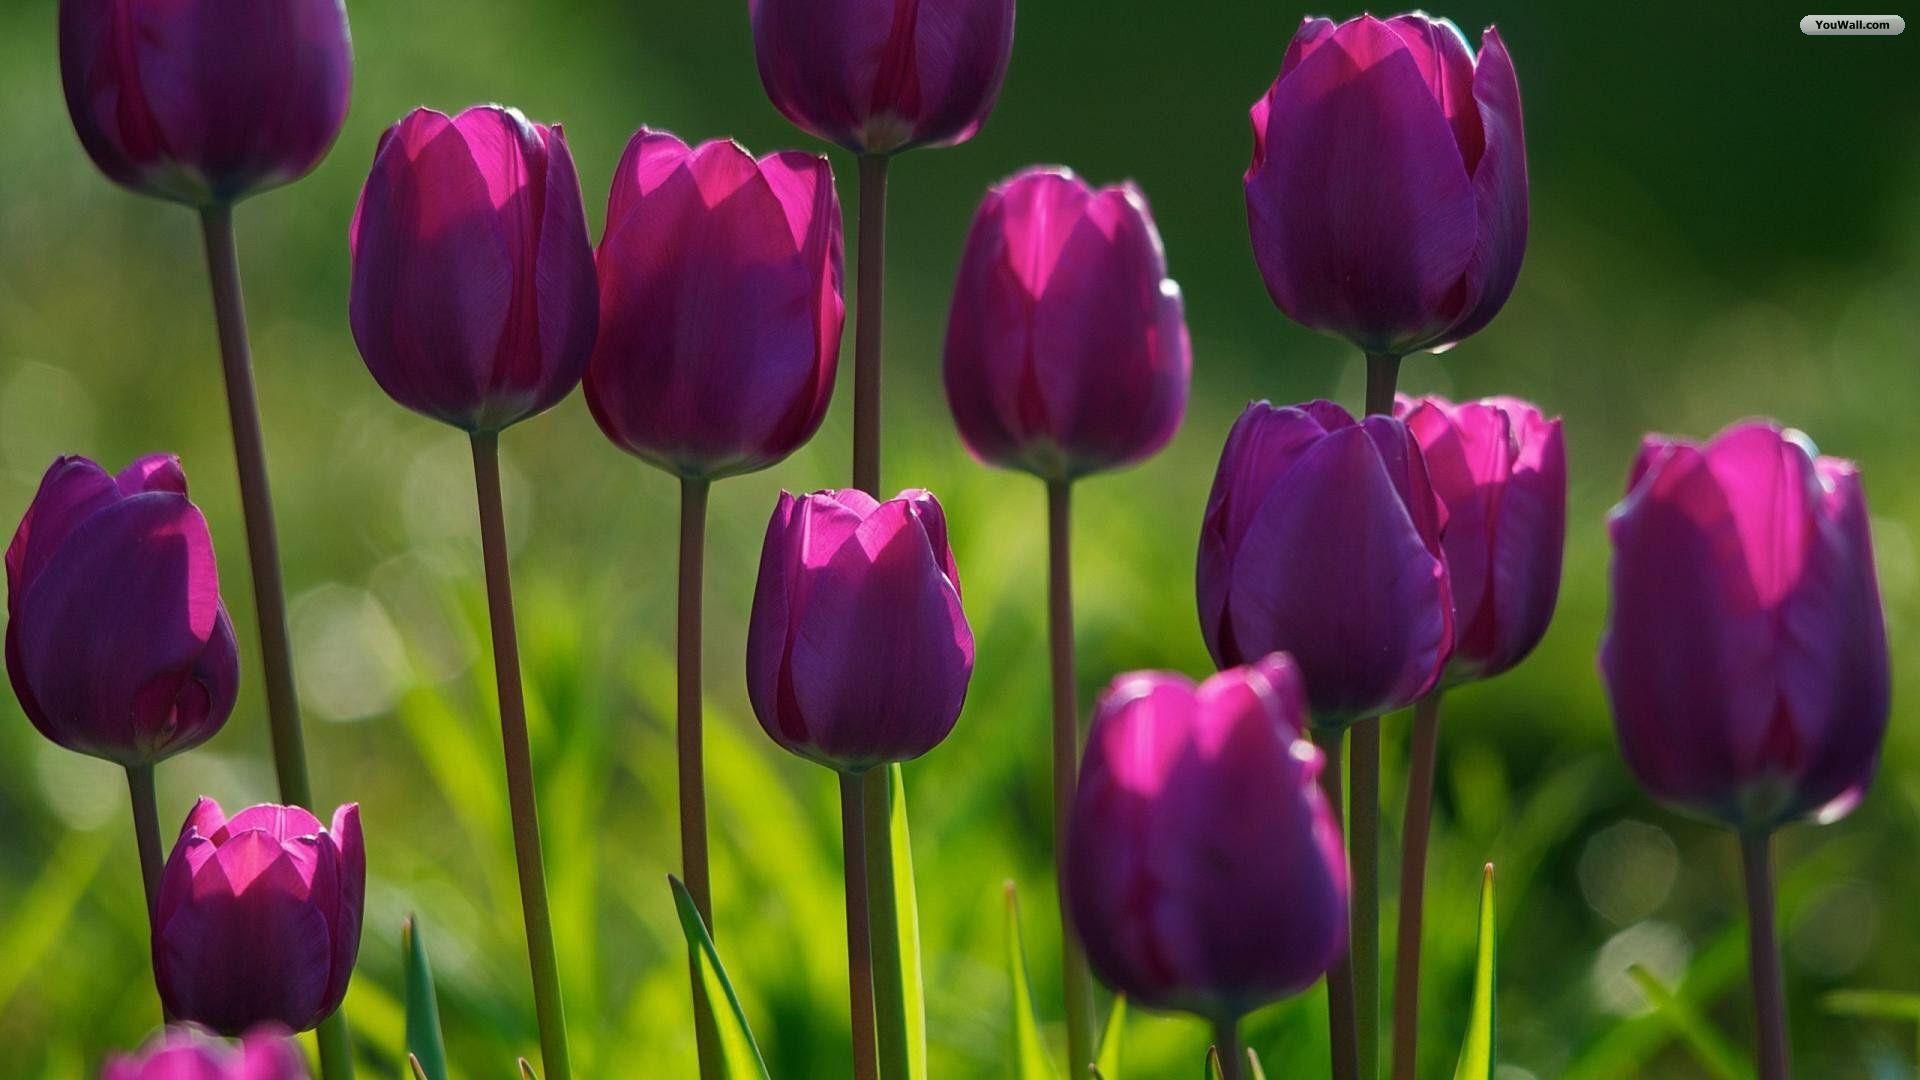 YouWall - Tulip Garden Wallpaper - wallpaper,wallpapers,free ...